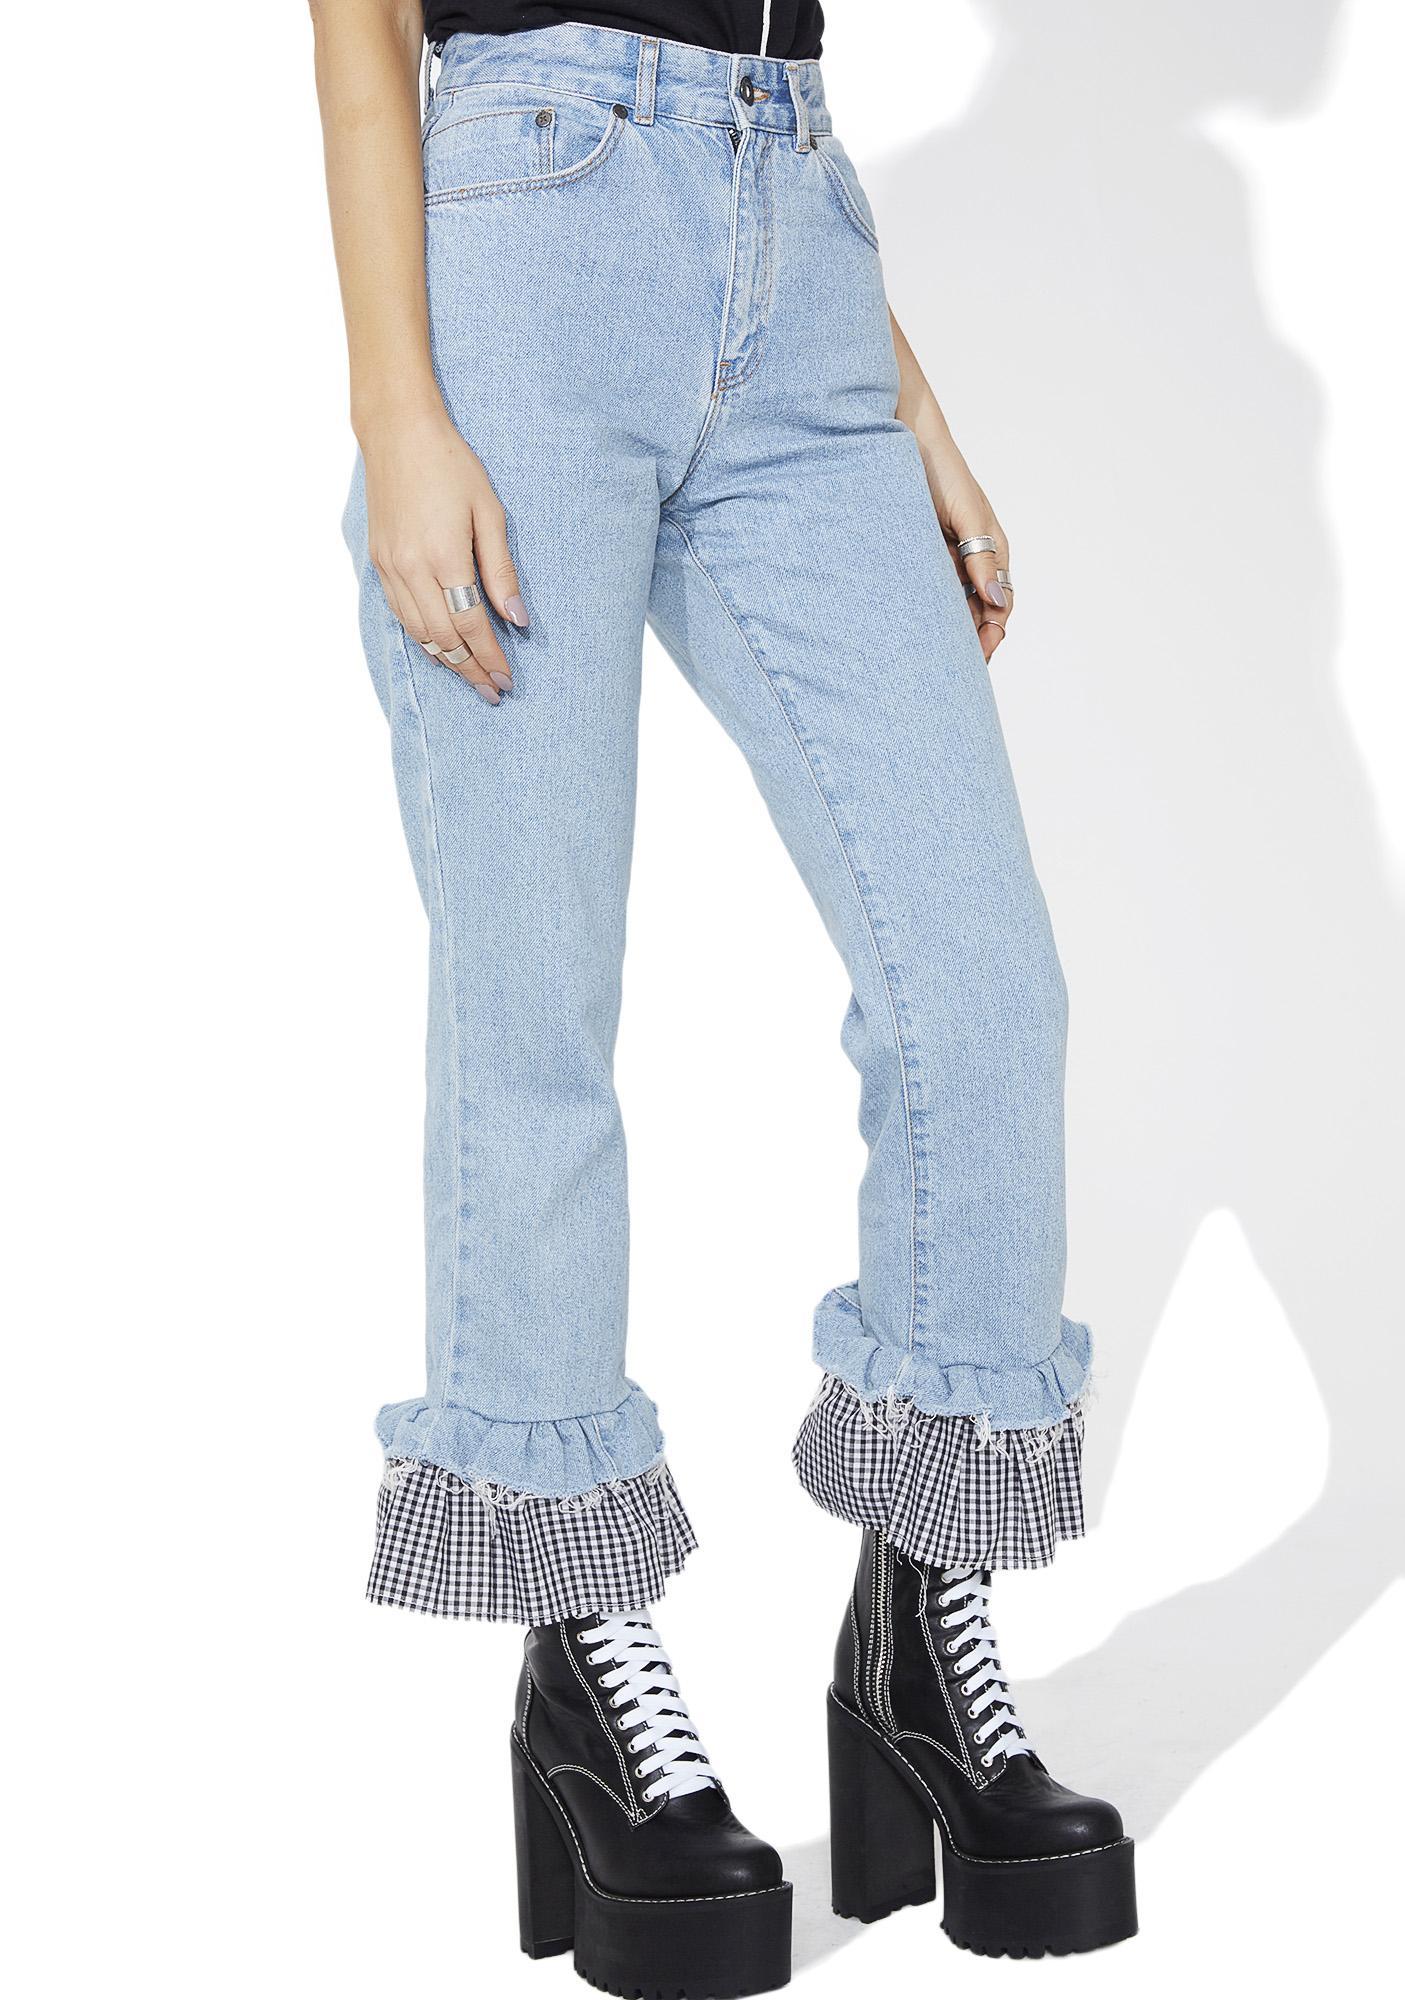 The Ragged Priest Savanna Jeans